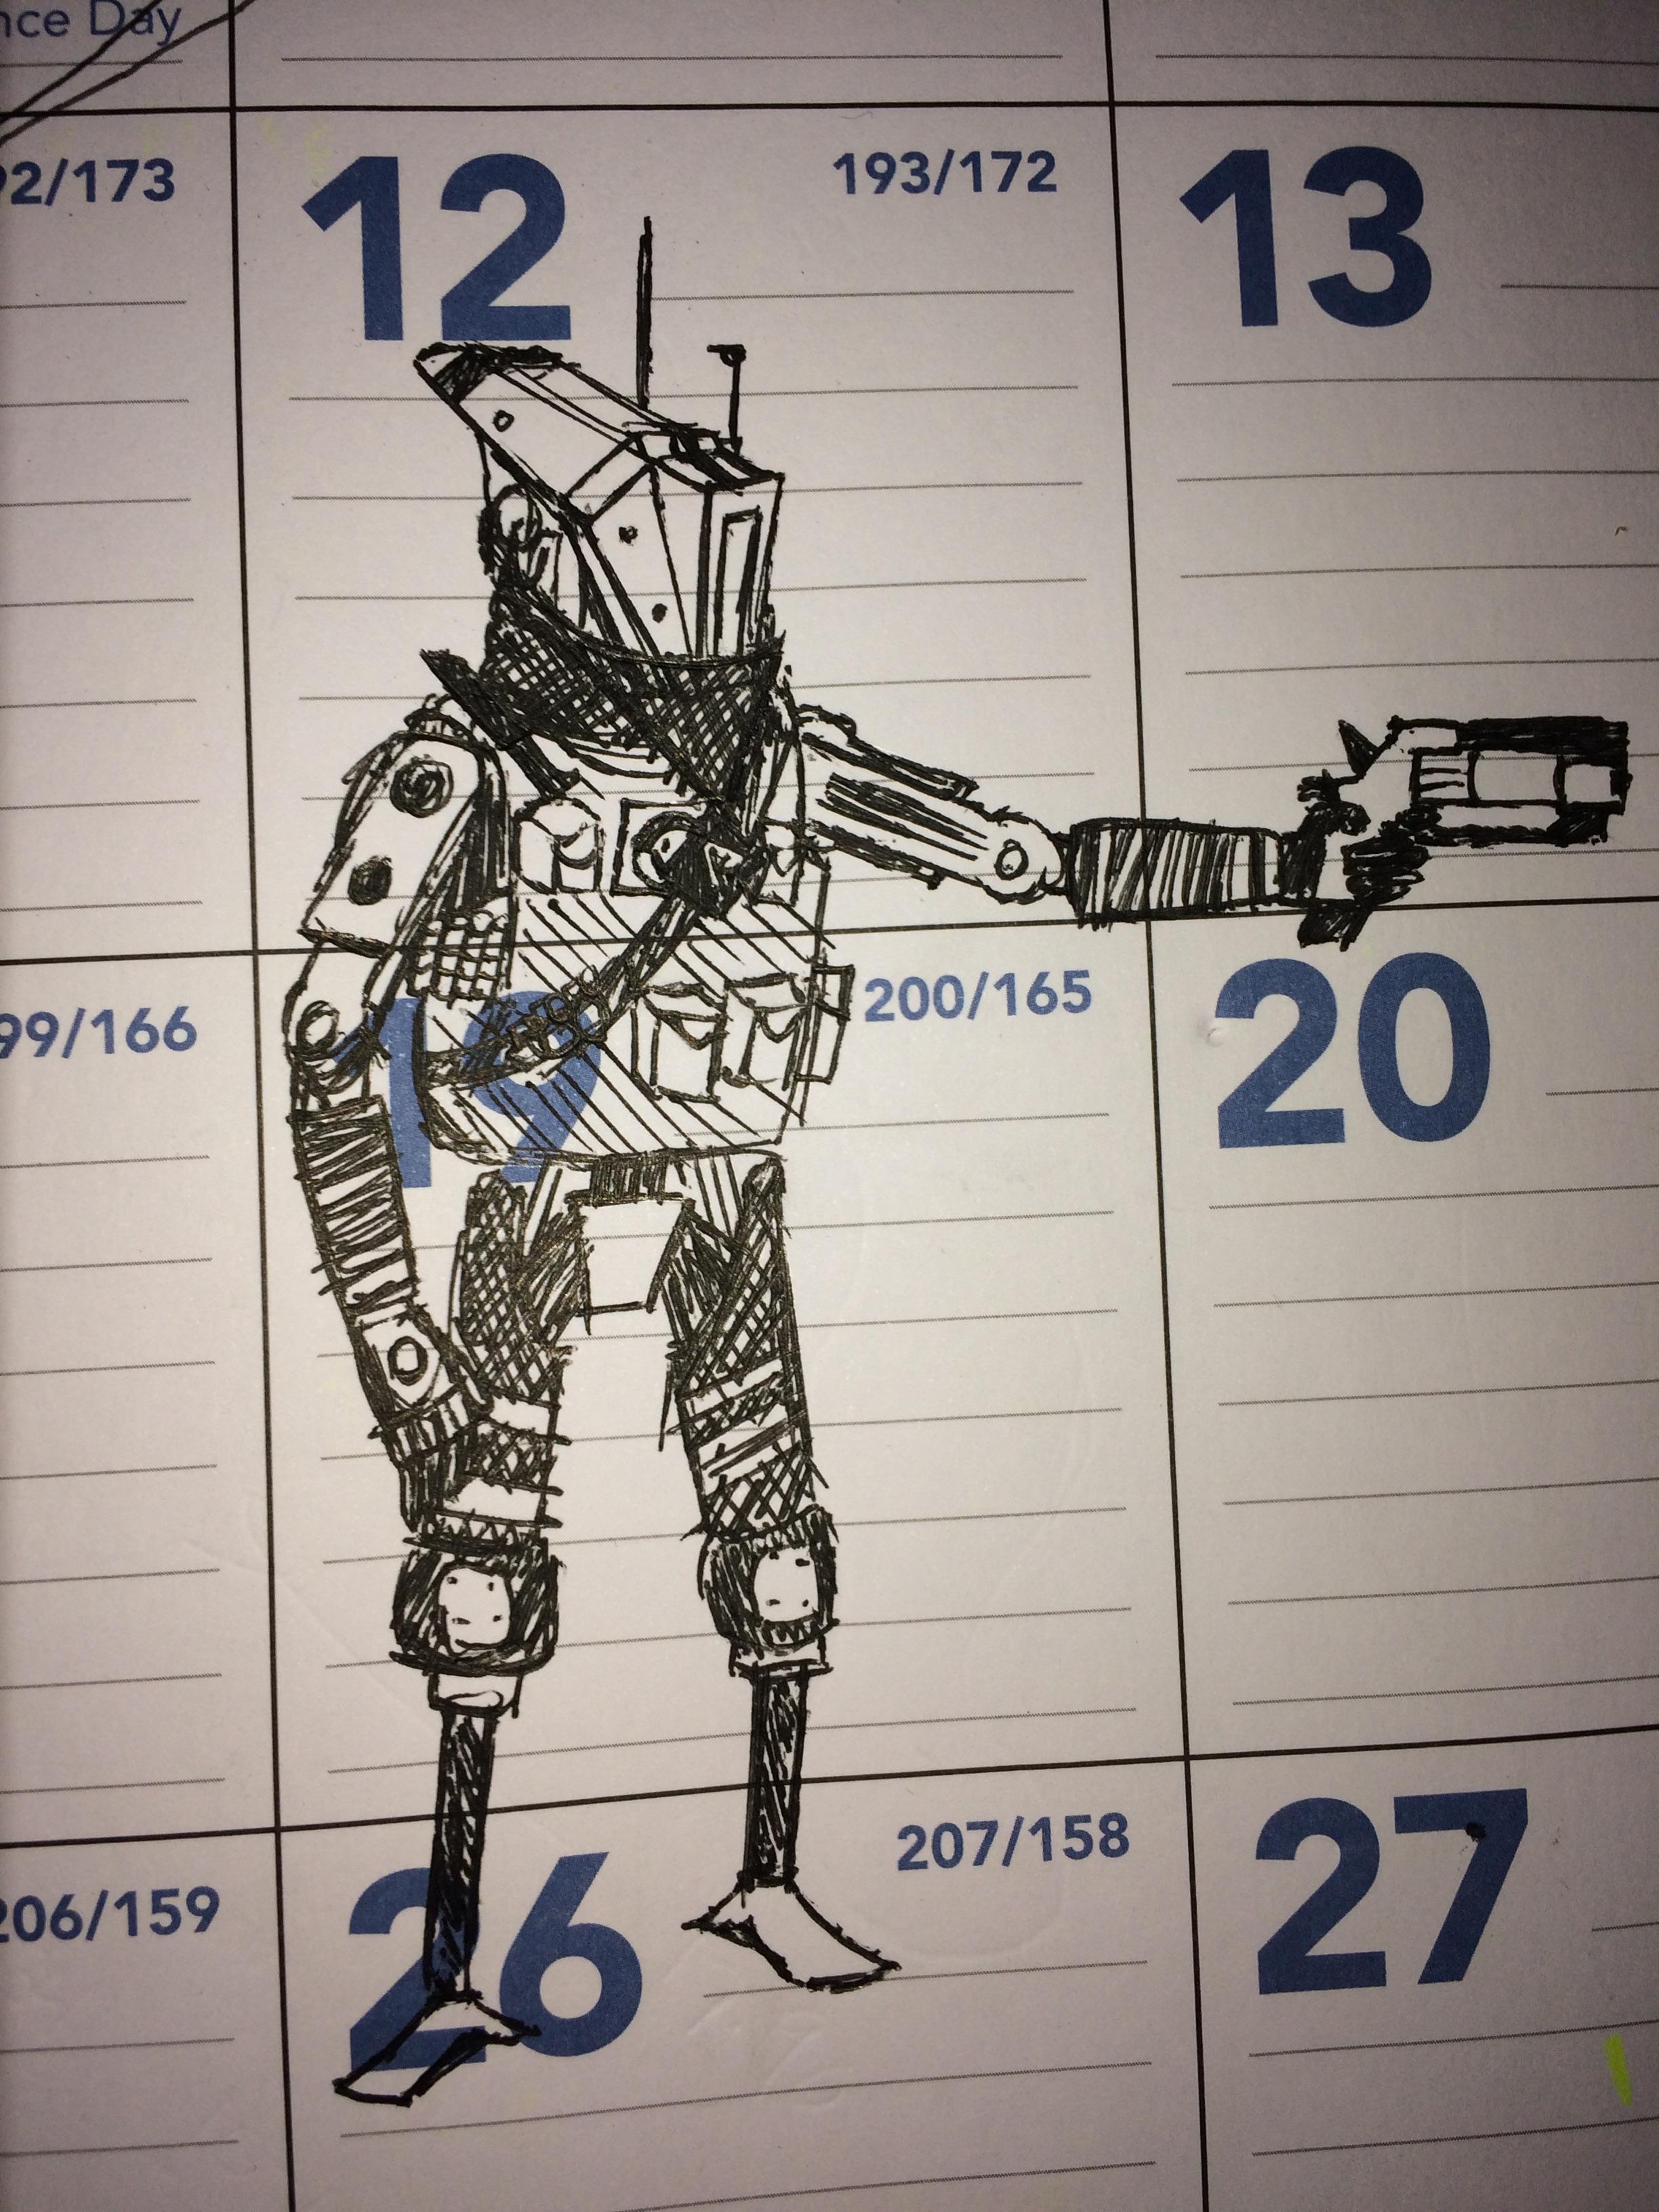 2448x3264 Phase Shift Pilot I Sketched On My Calendar